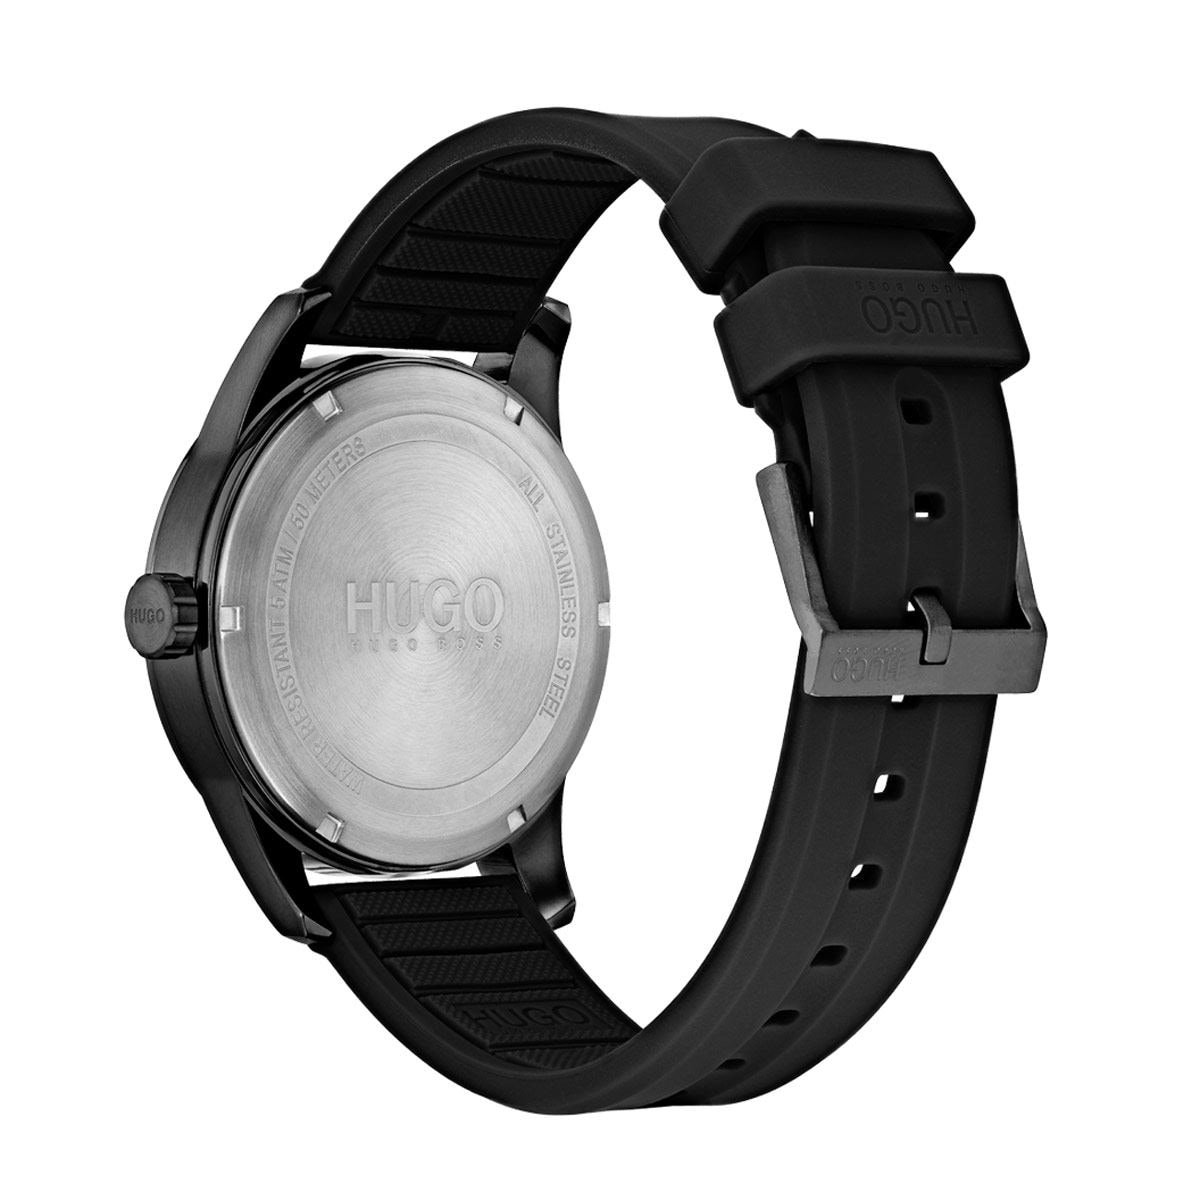 Reloj Hugo Boss para Caballero Negro 1530014